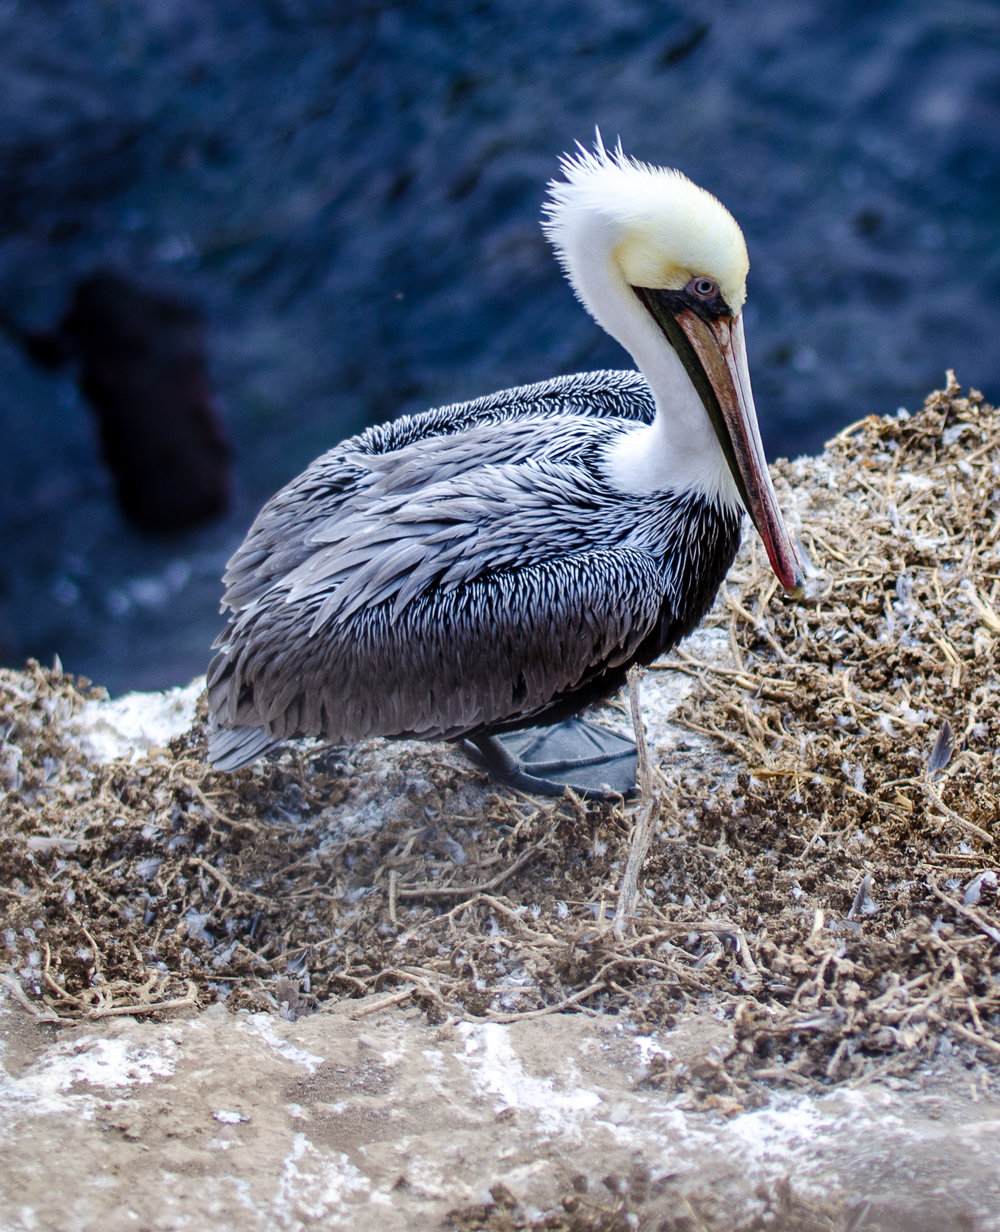 La Jolla Cove Birding